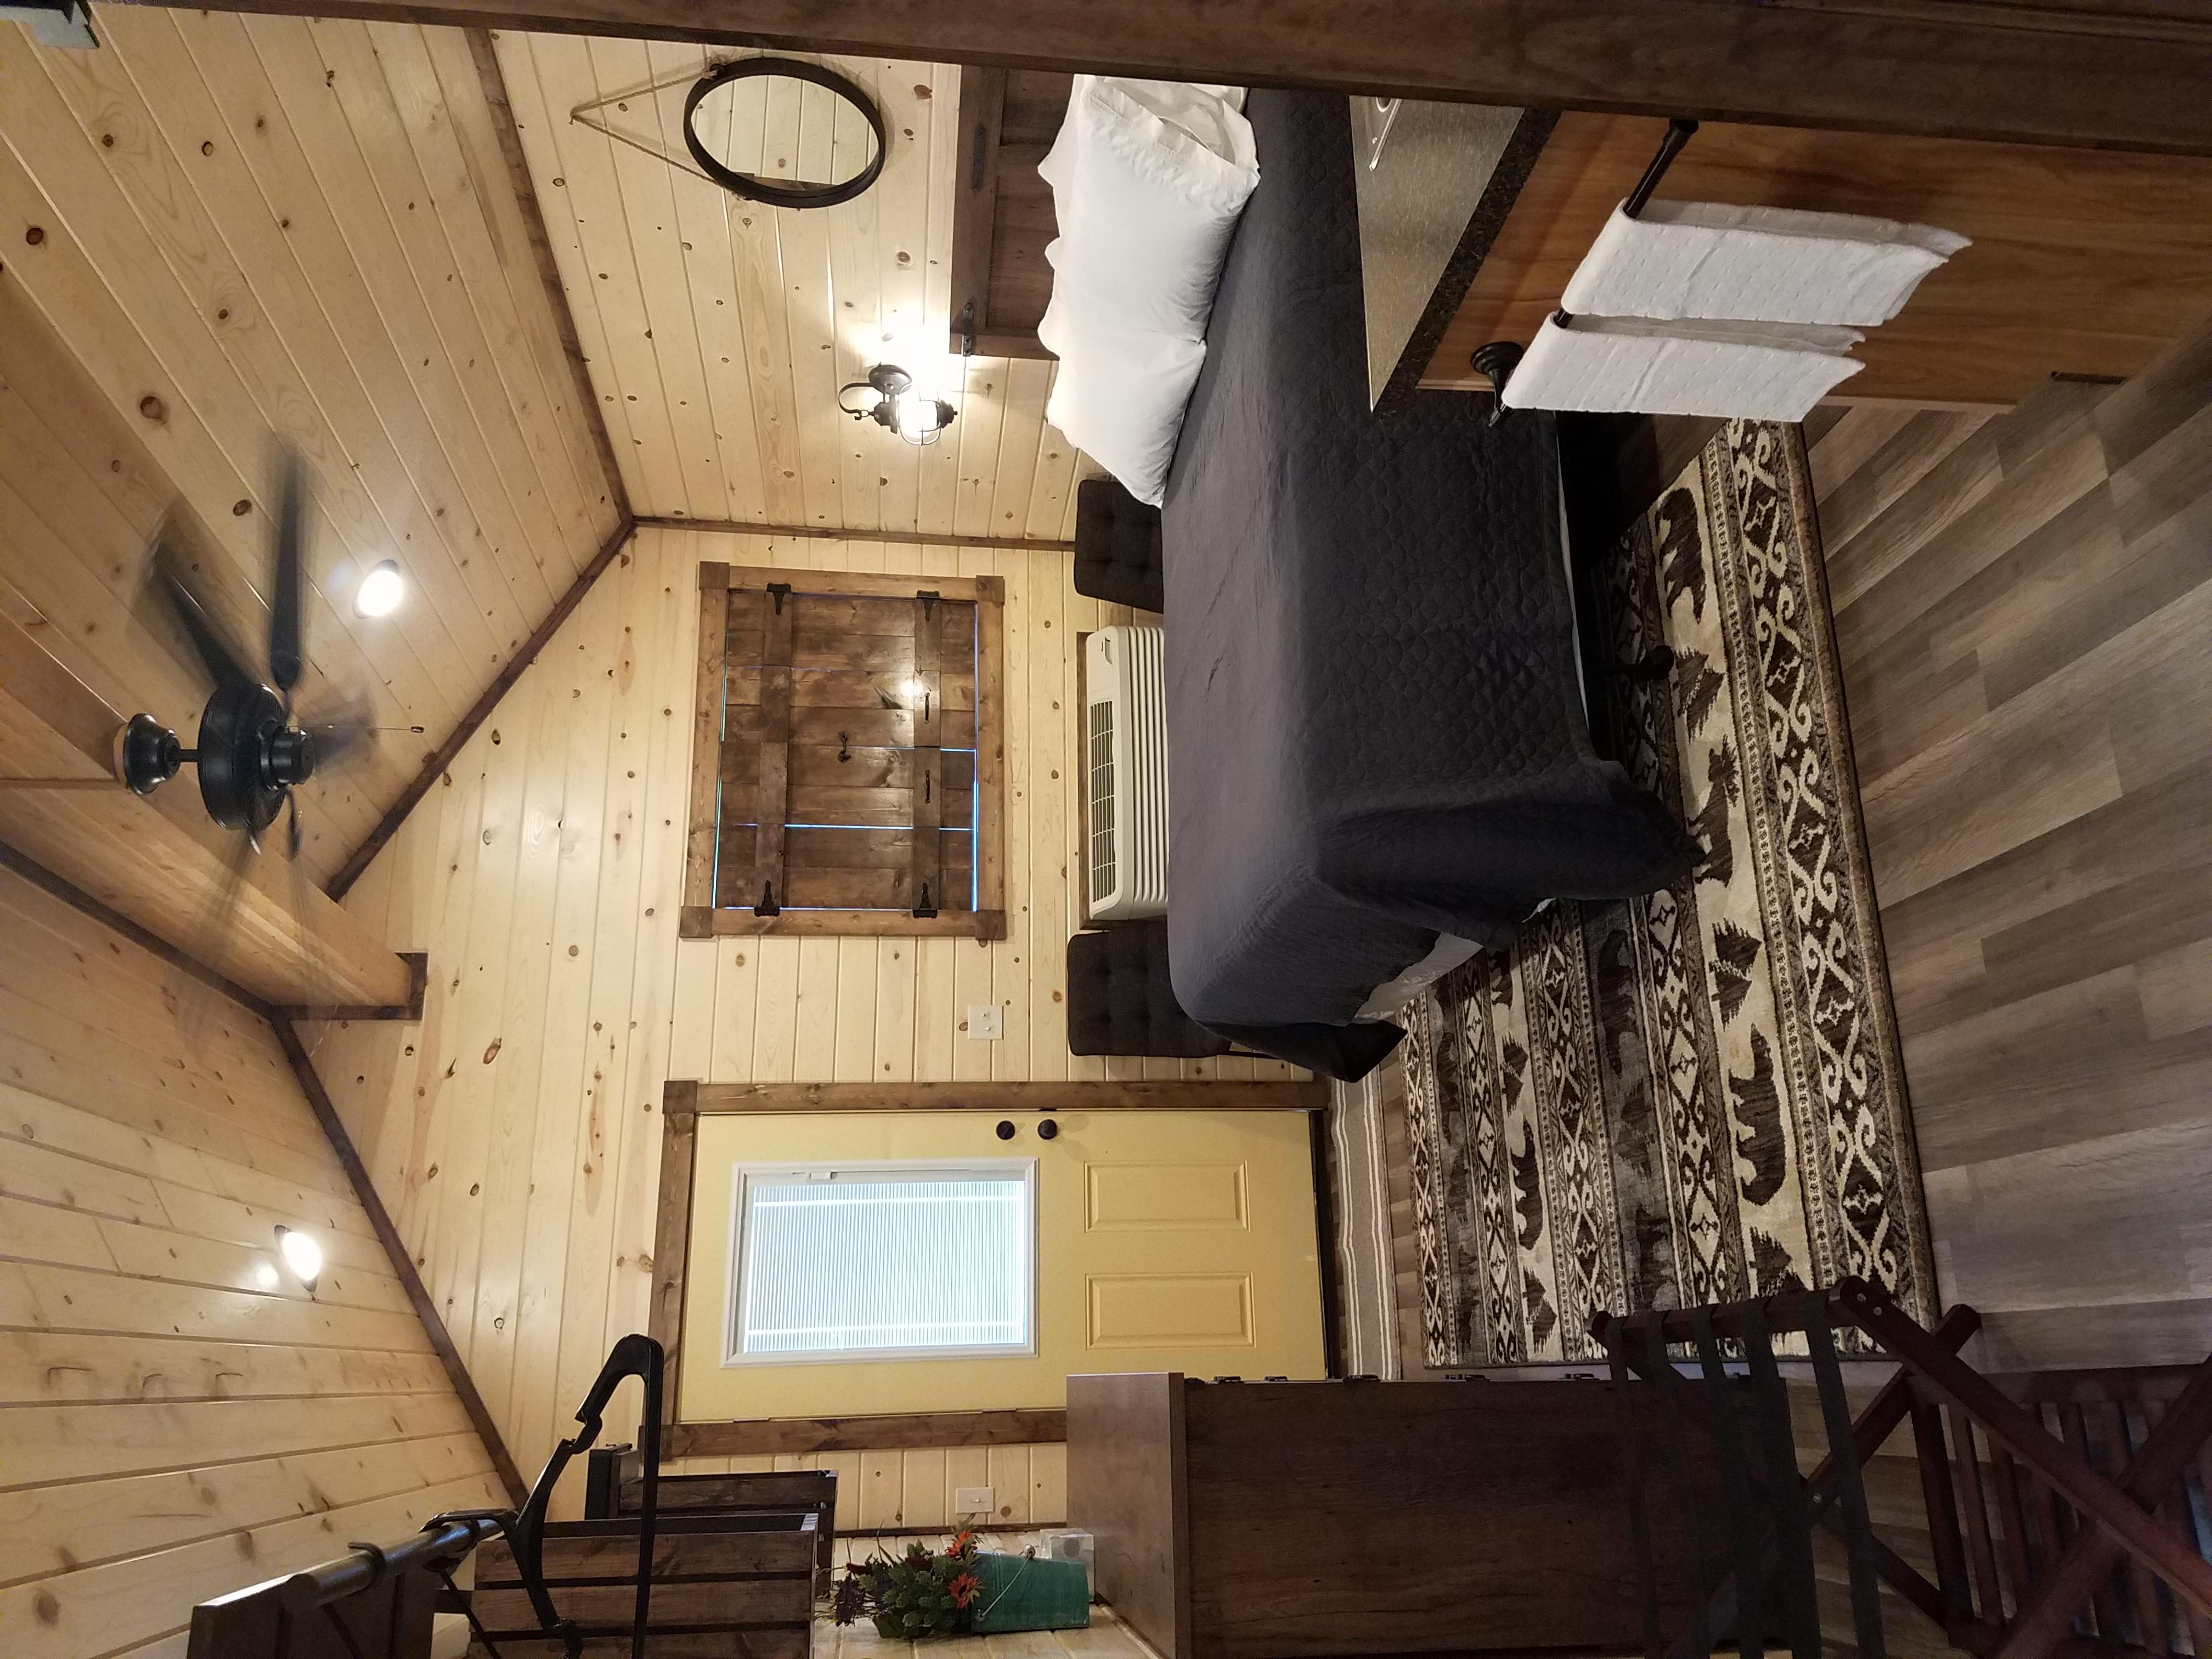 interior 3 b